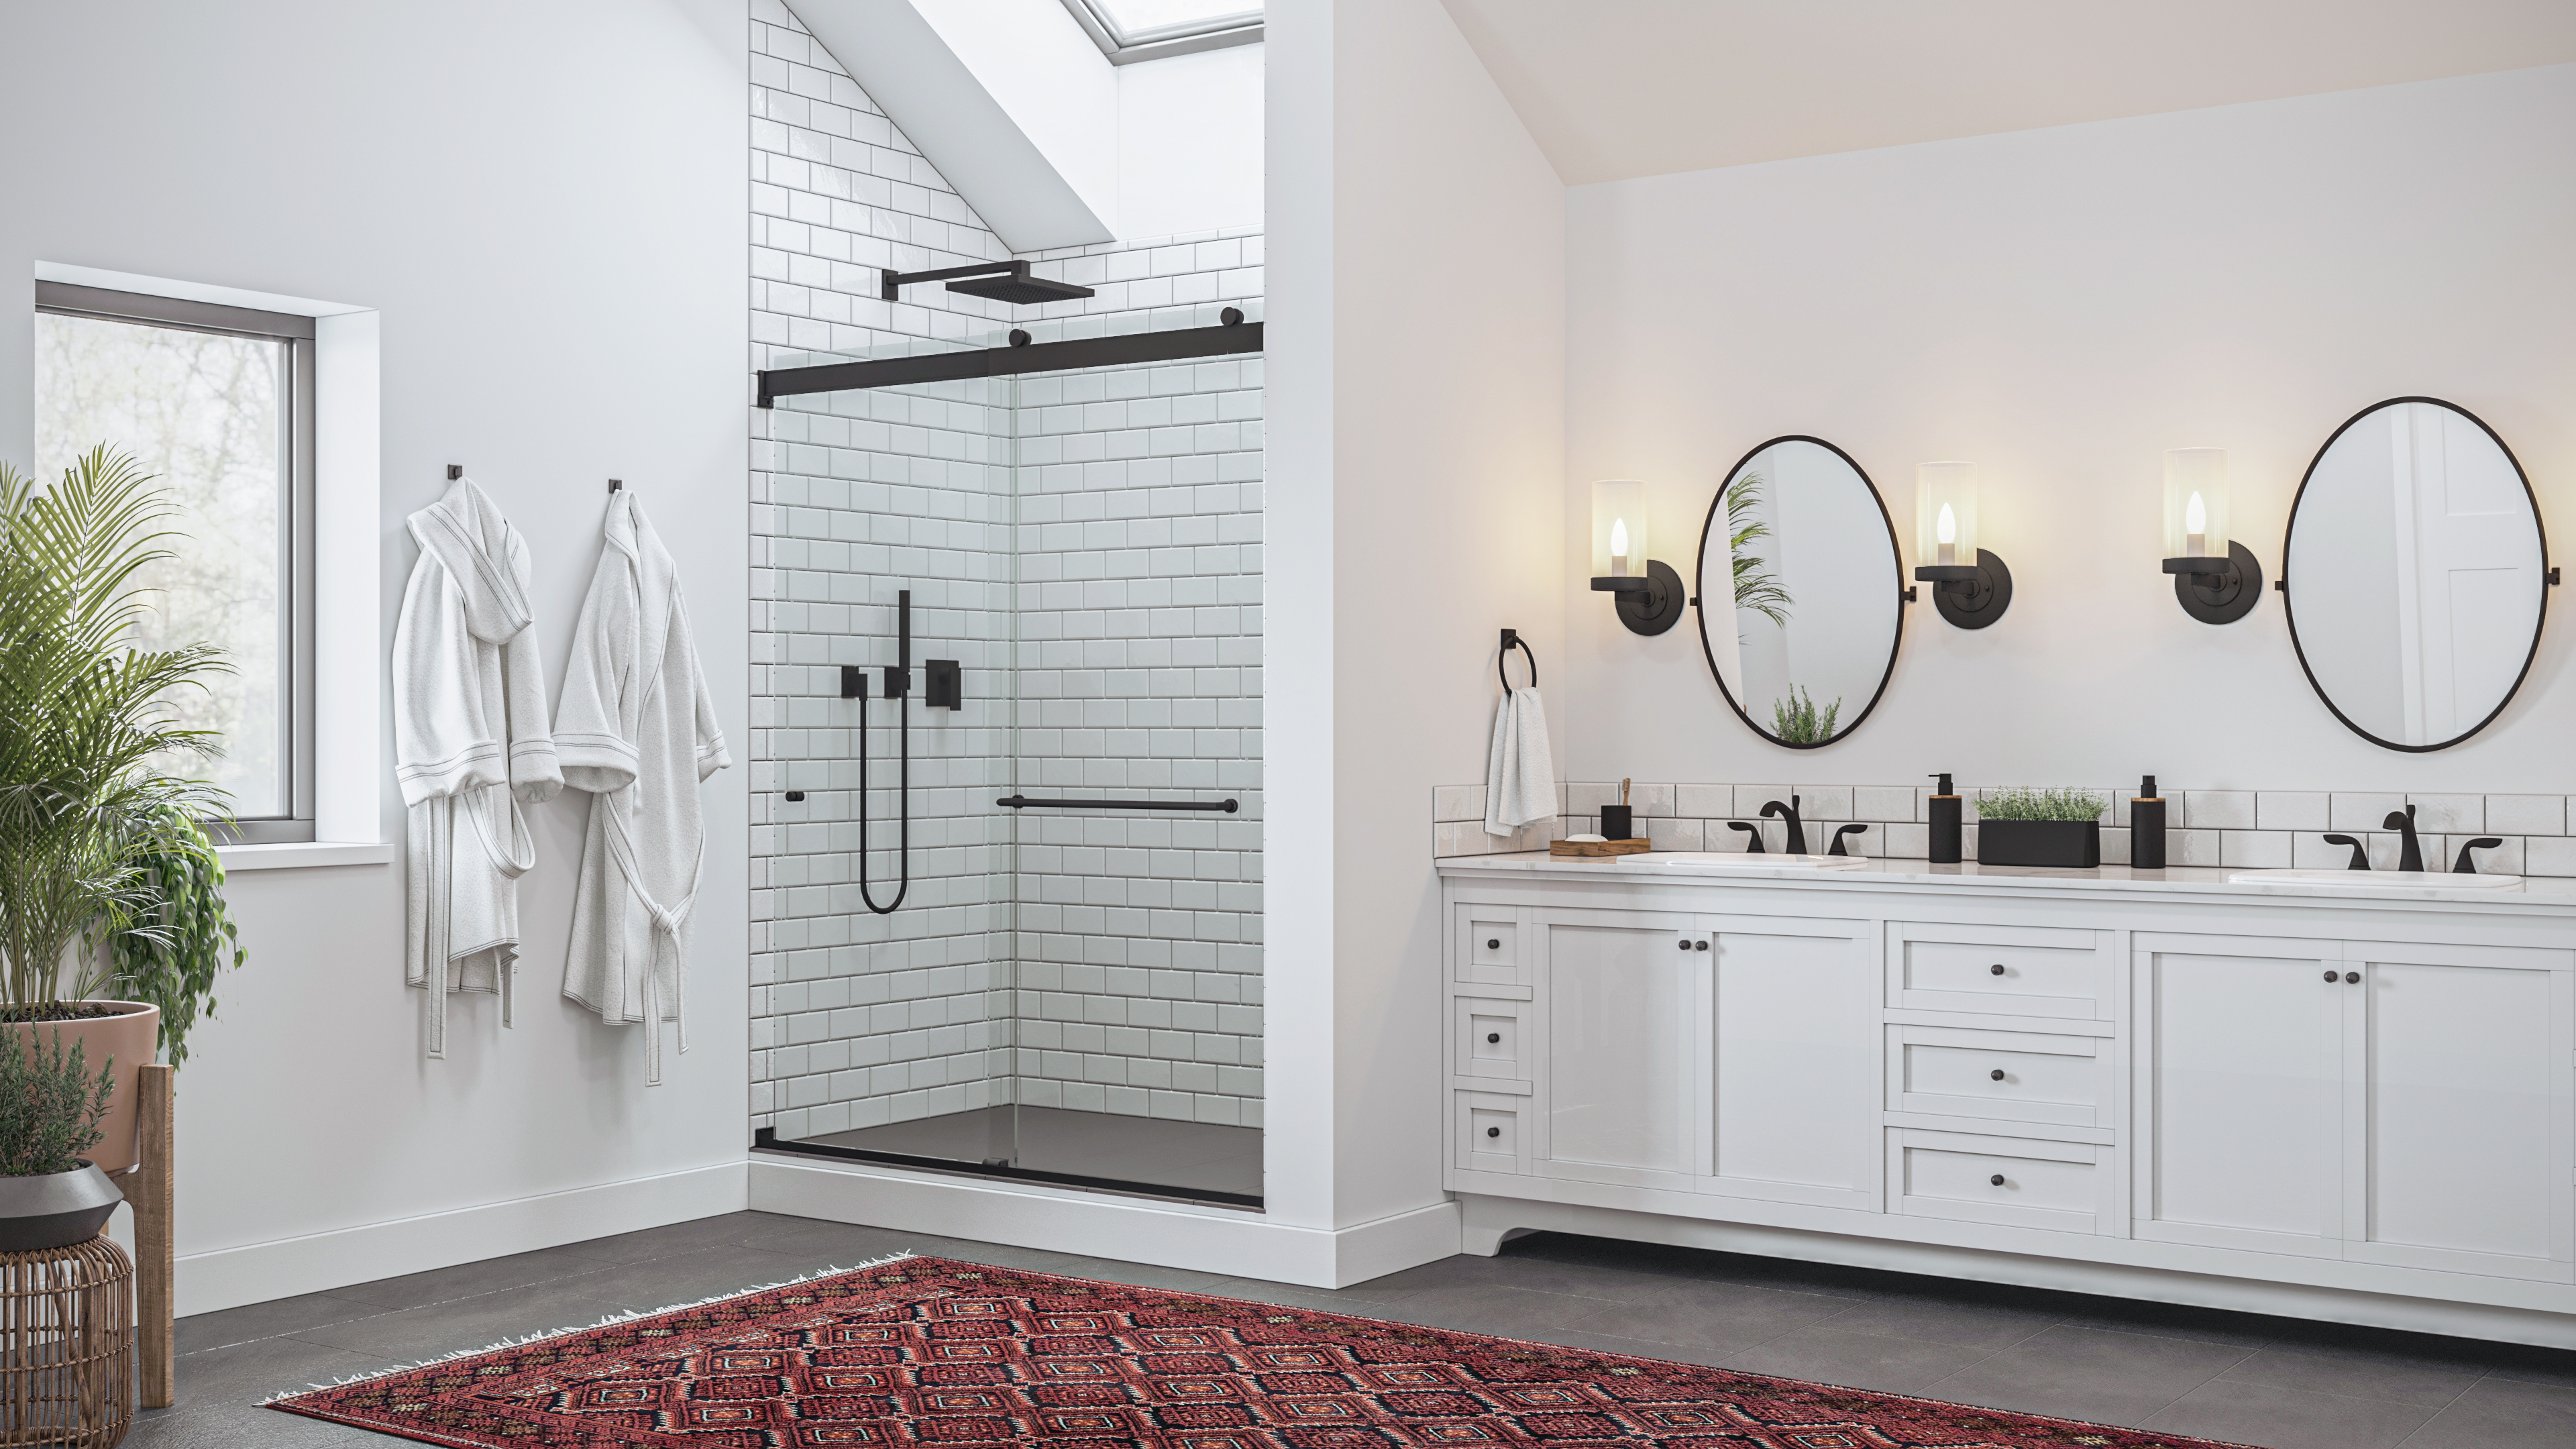 Basco Rotolo Lux full shower matte black FINAL